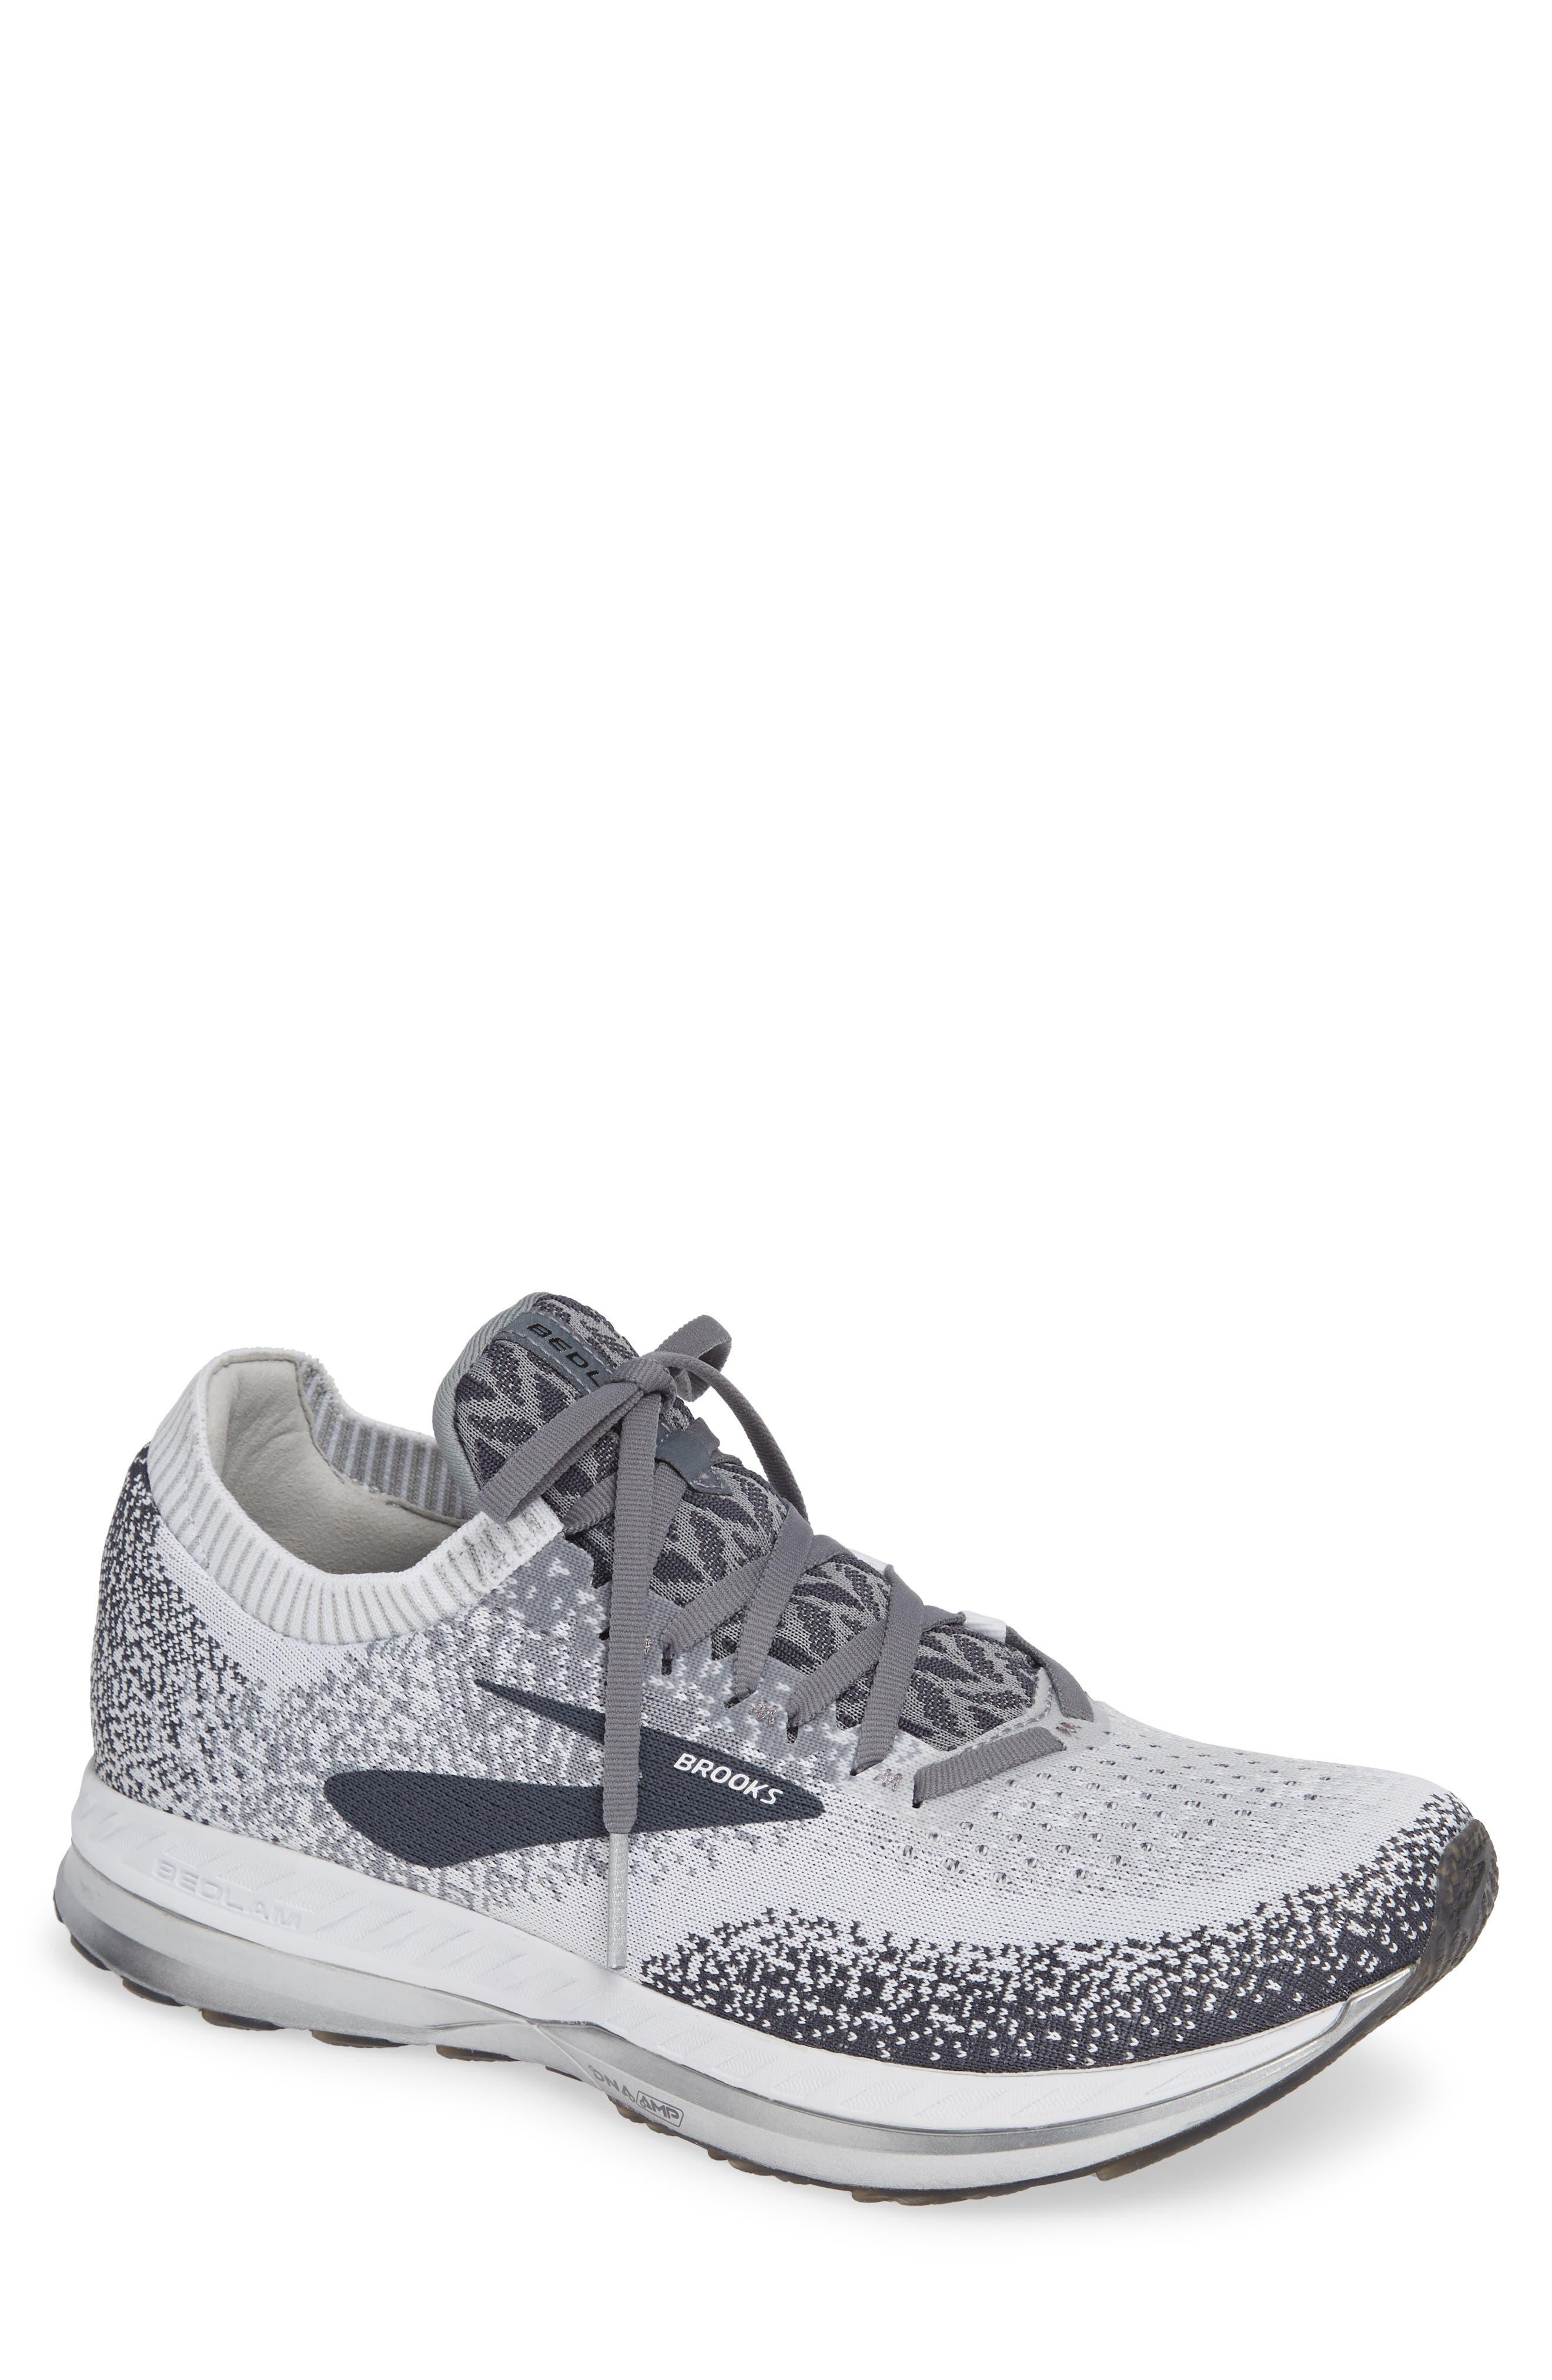 Brooks Bedlam Running Shoe - Grey